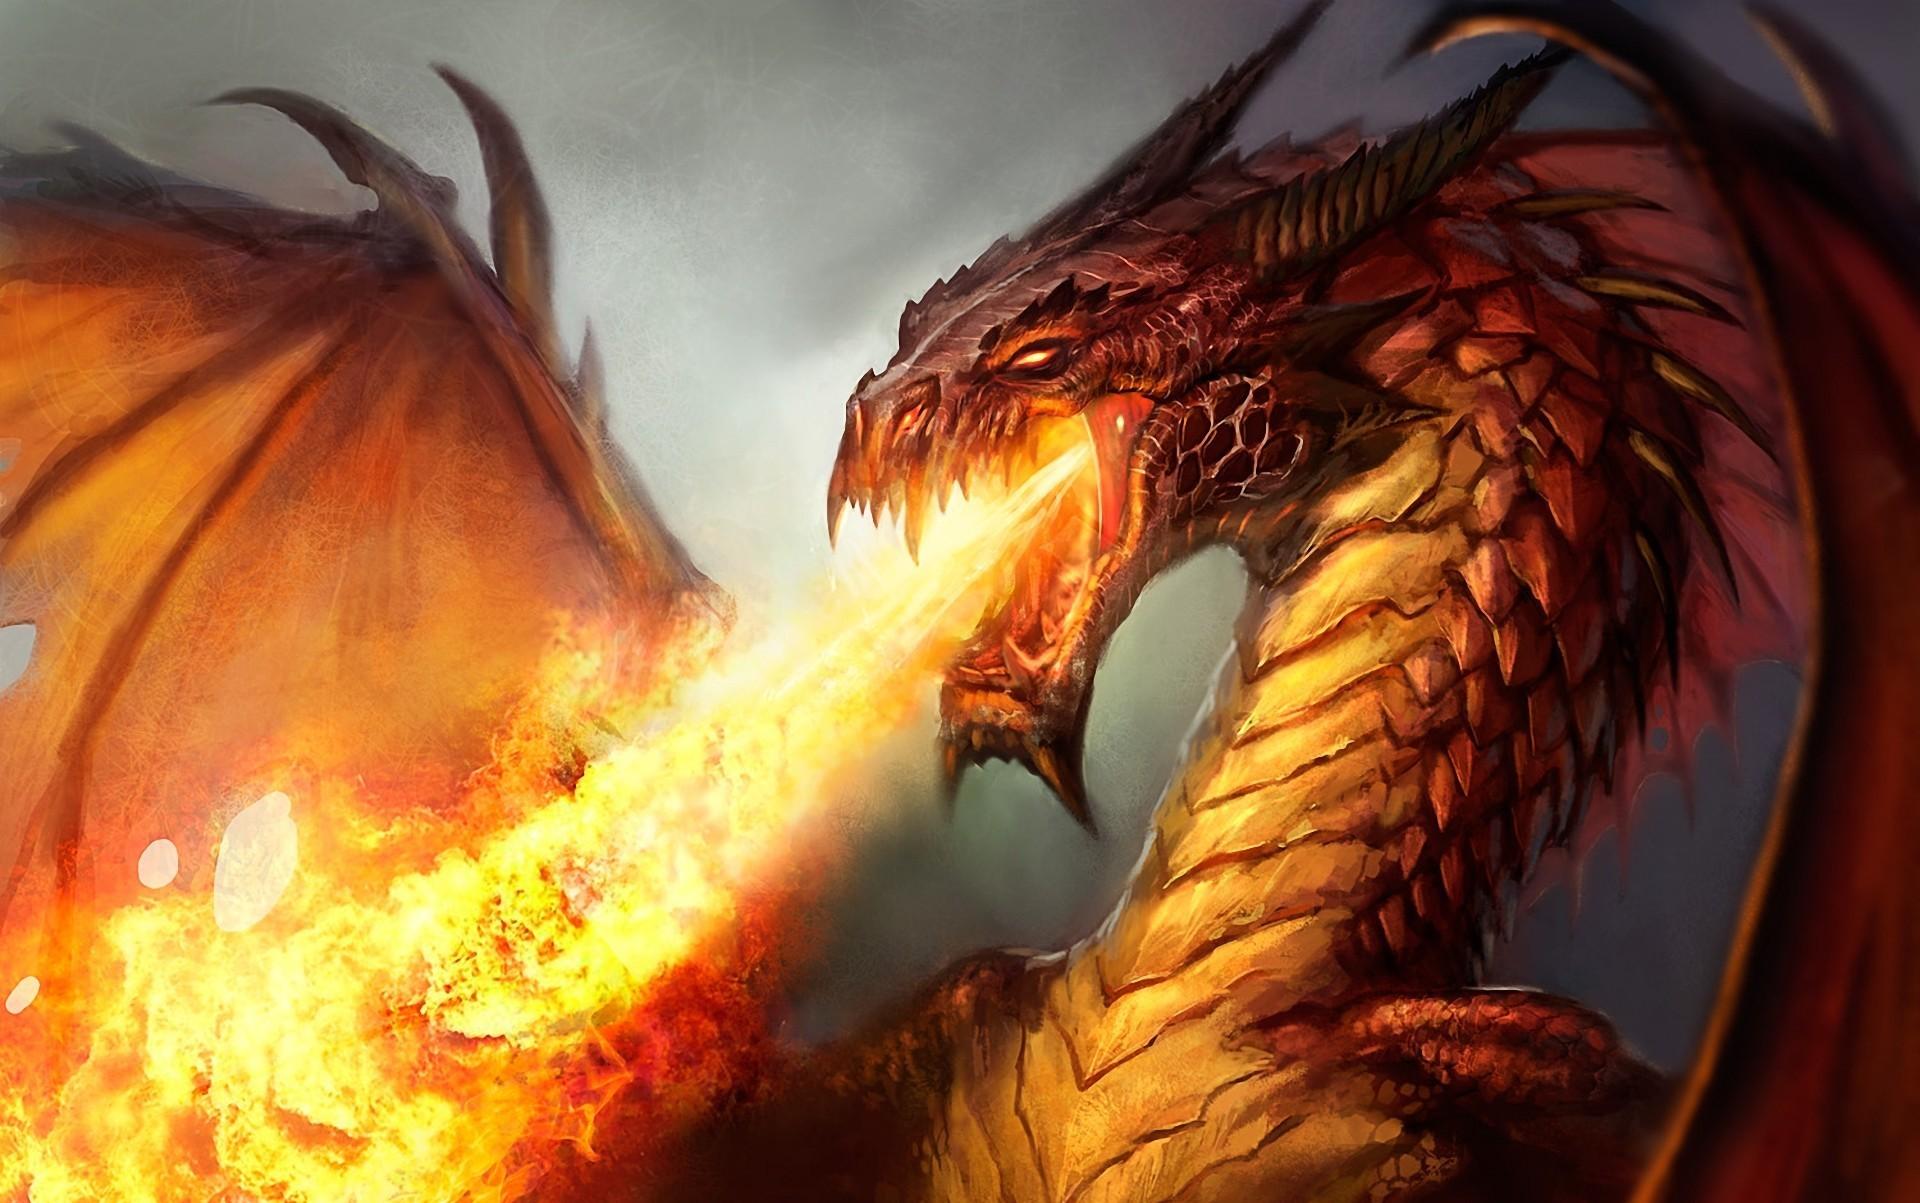 Картинки с драконами огня